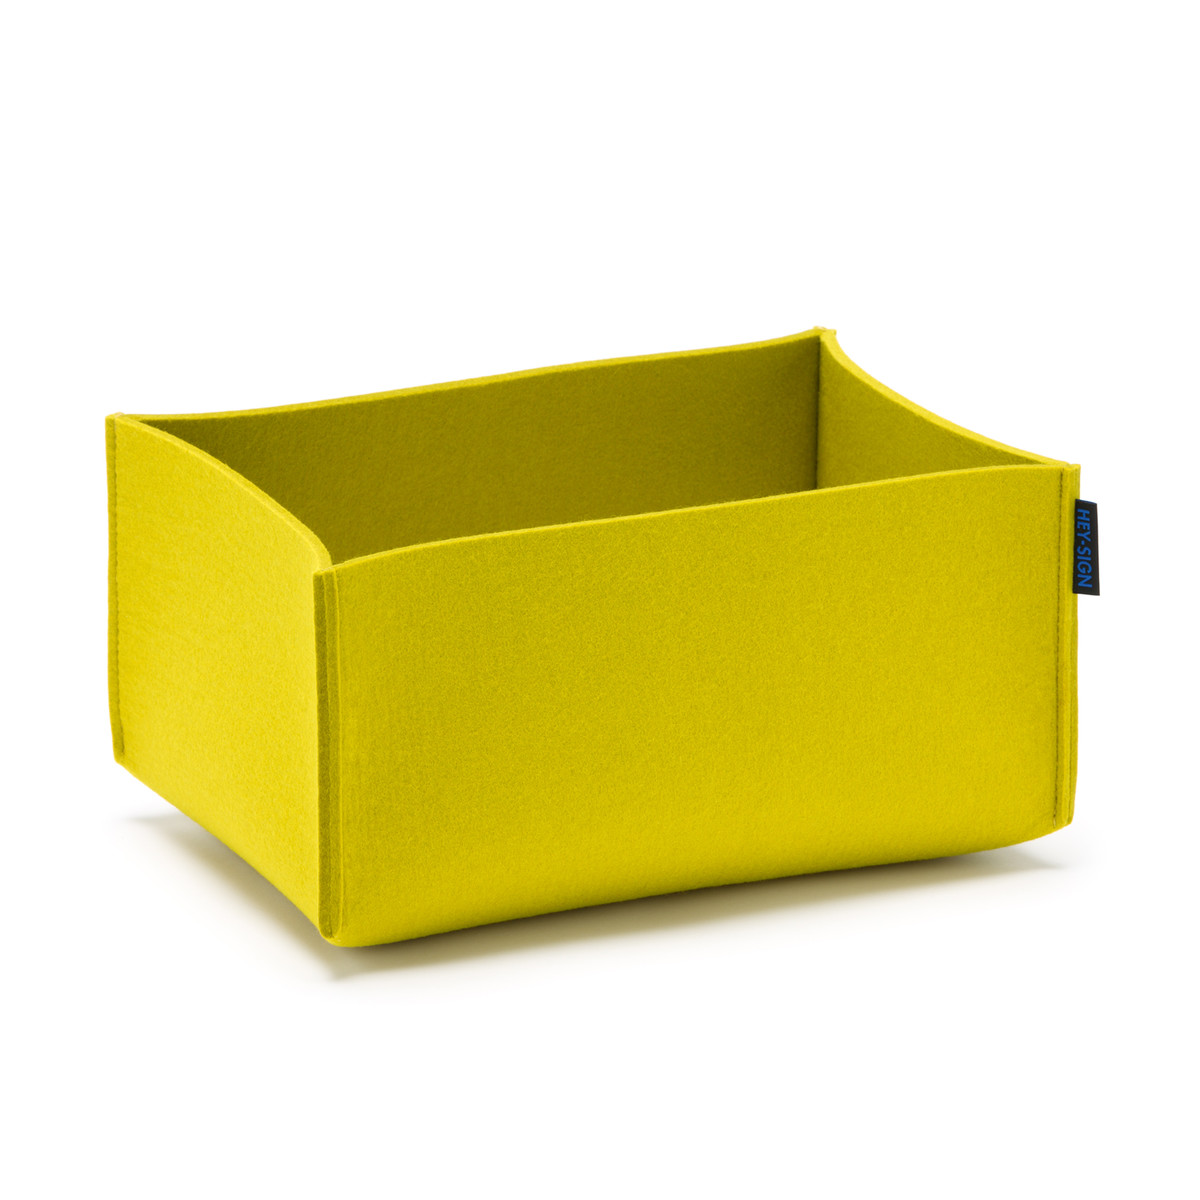 how to find volume rectangular box